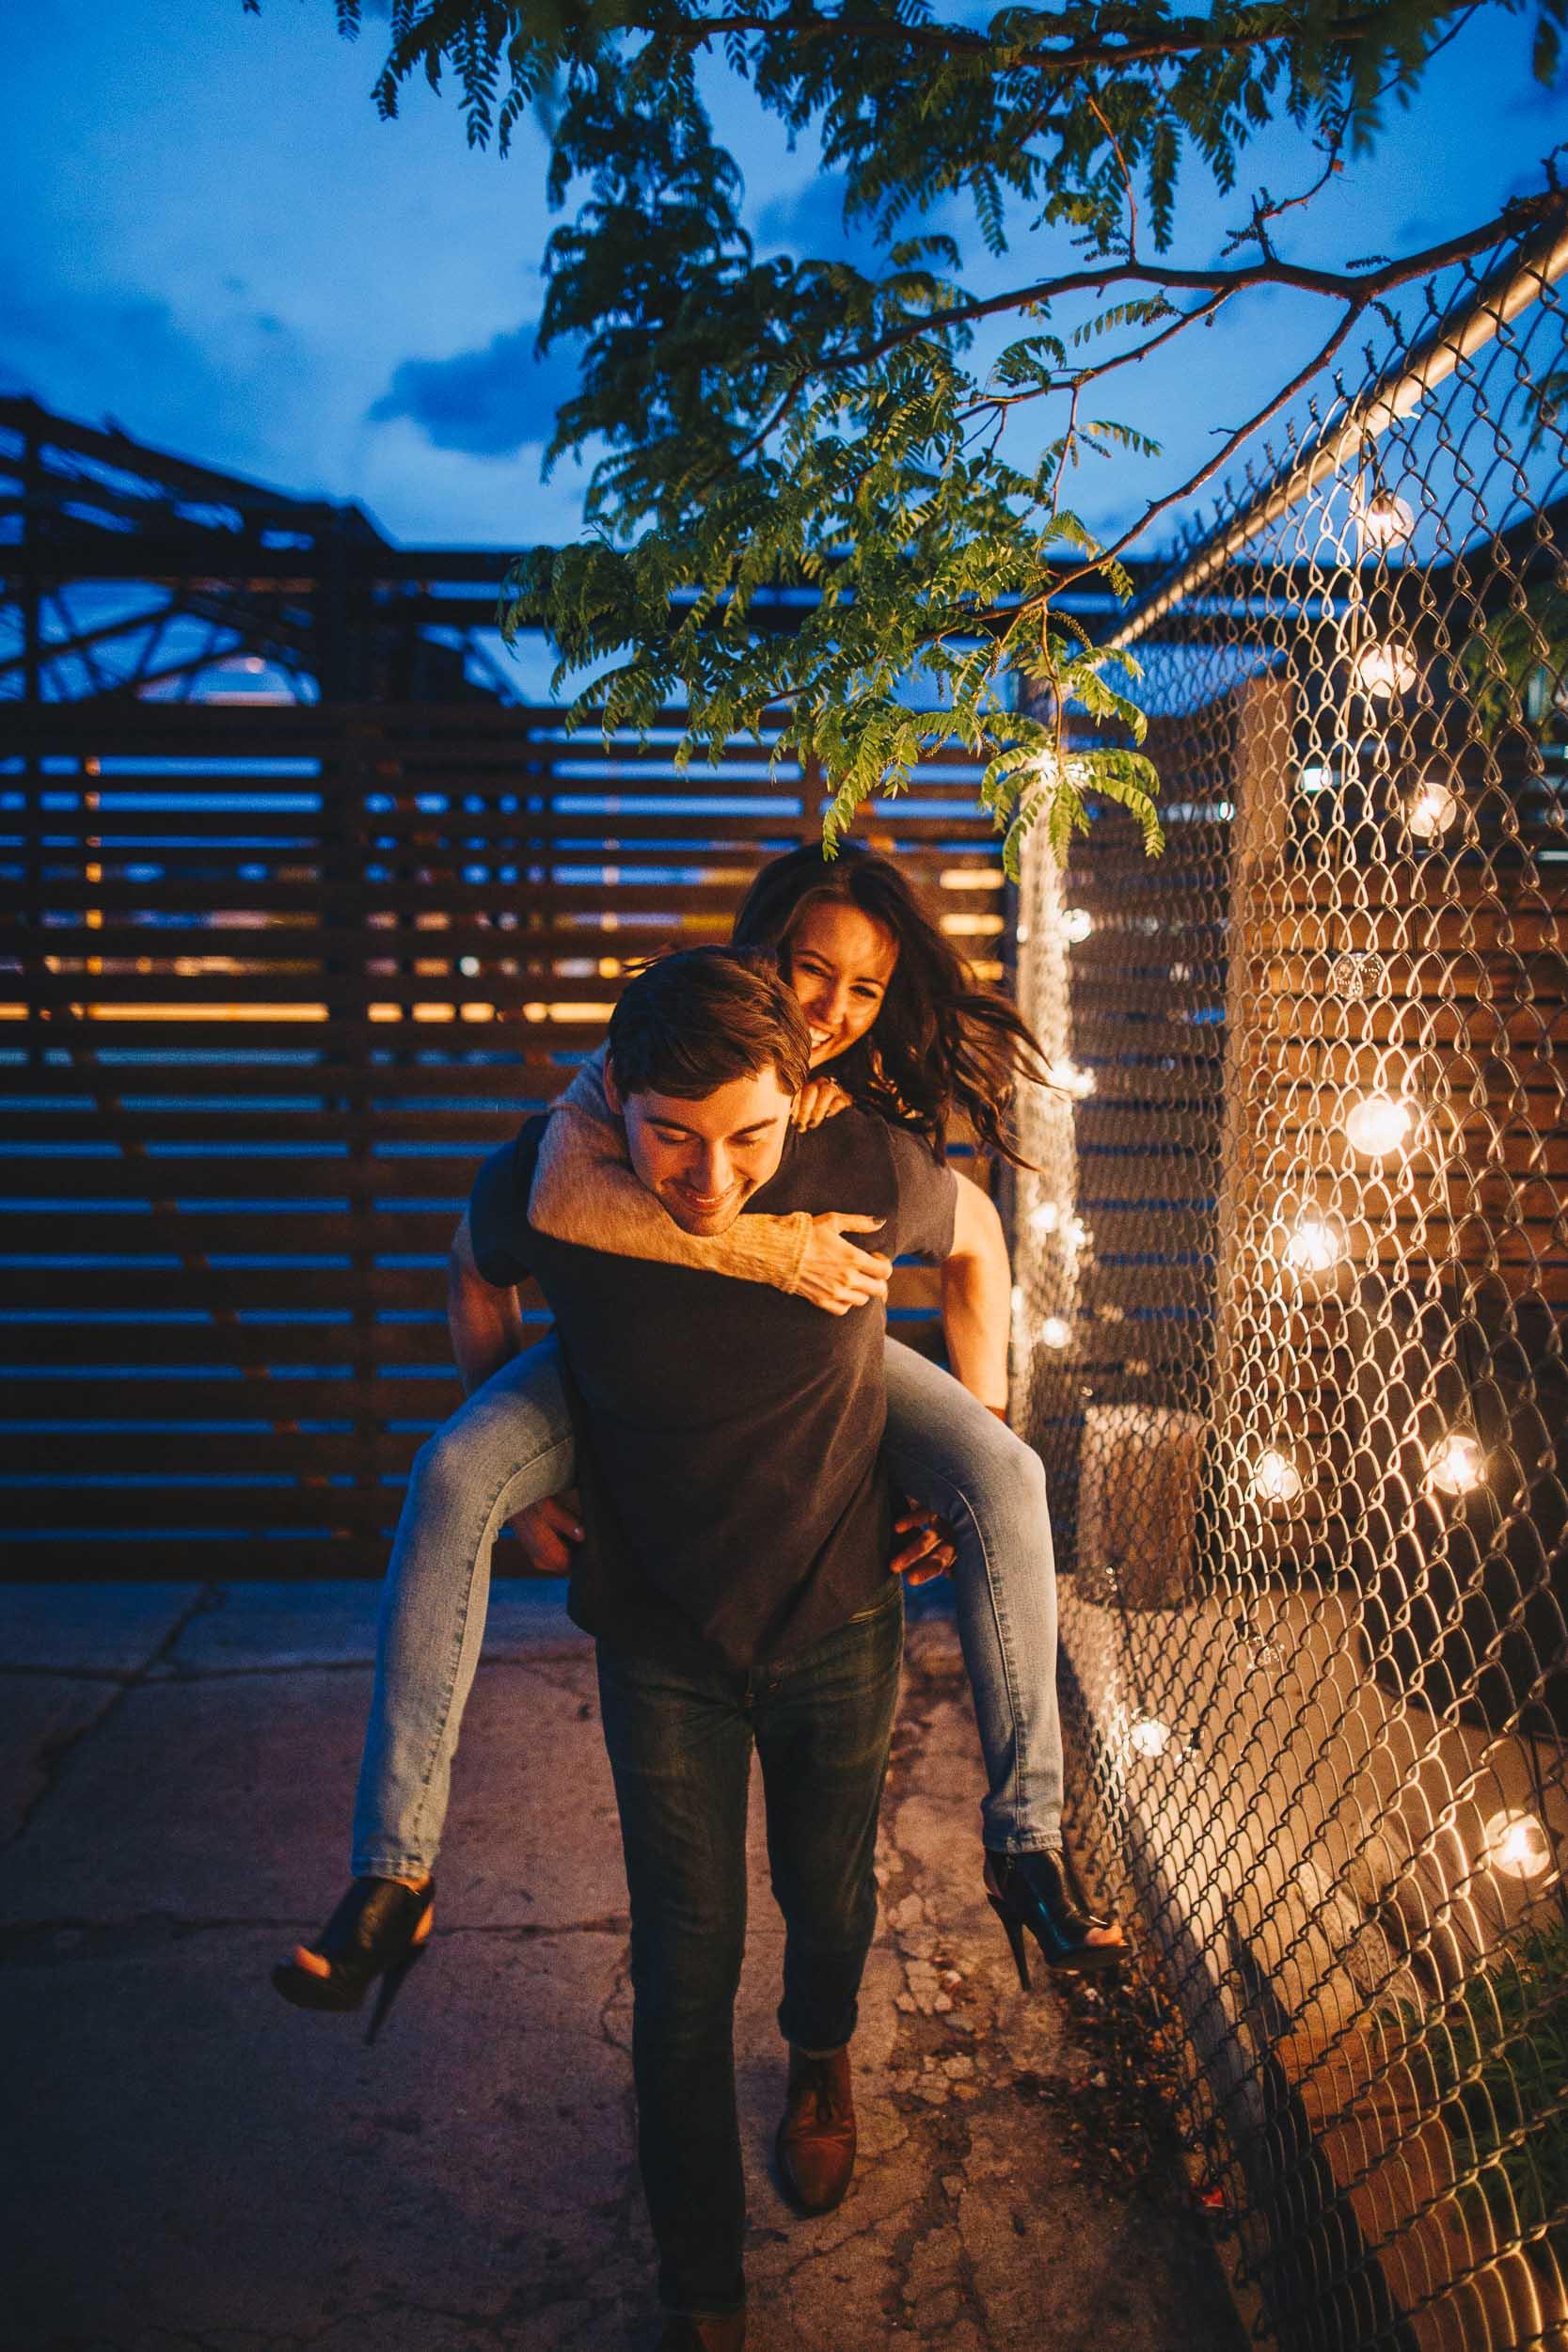 Blog-Marissa and Josh Engagement 5.6.18-115.jpg